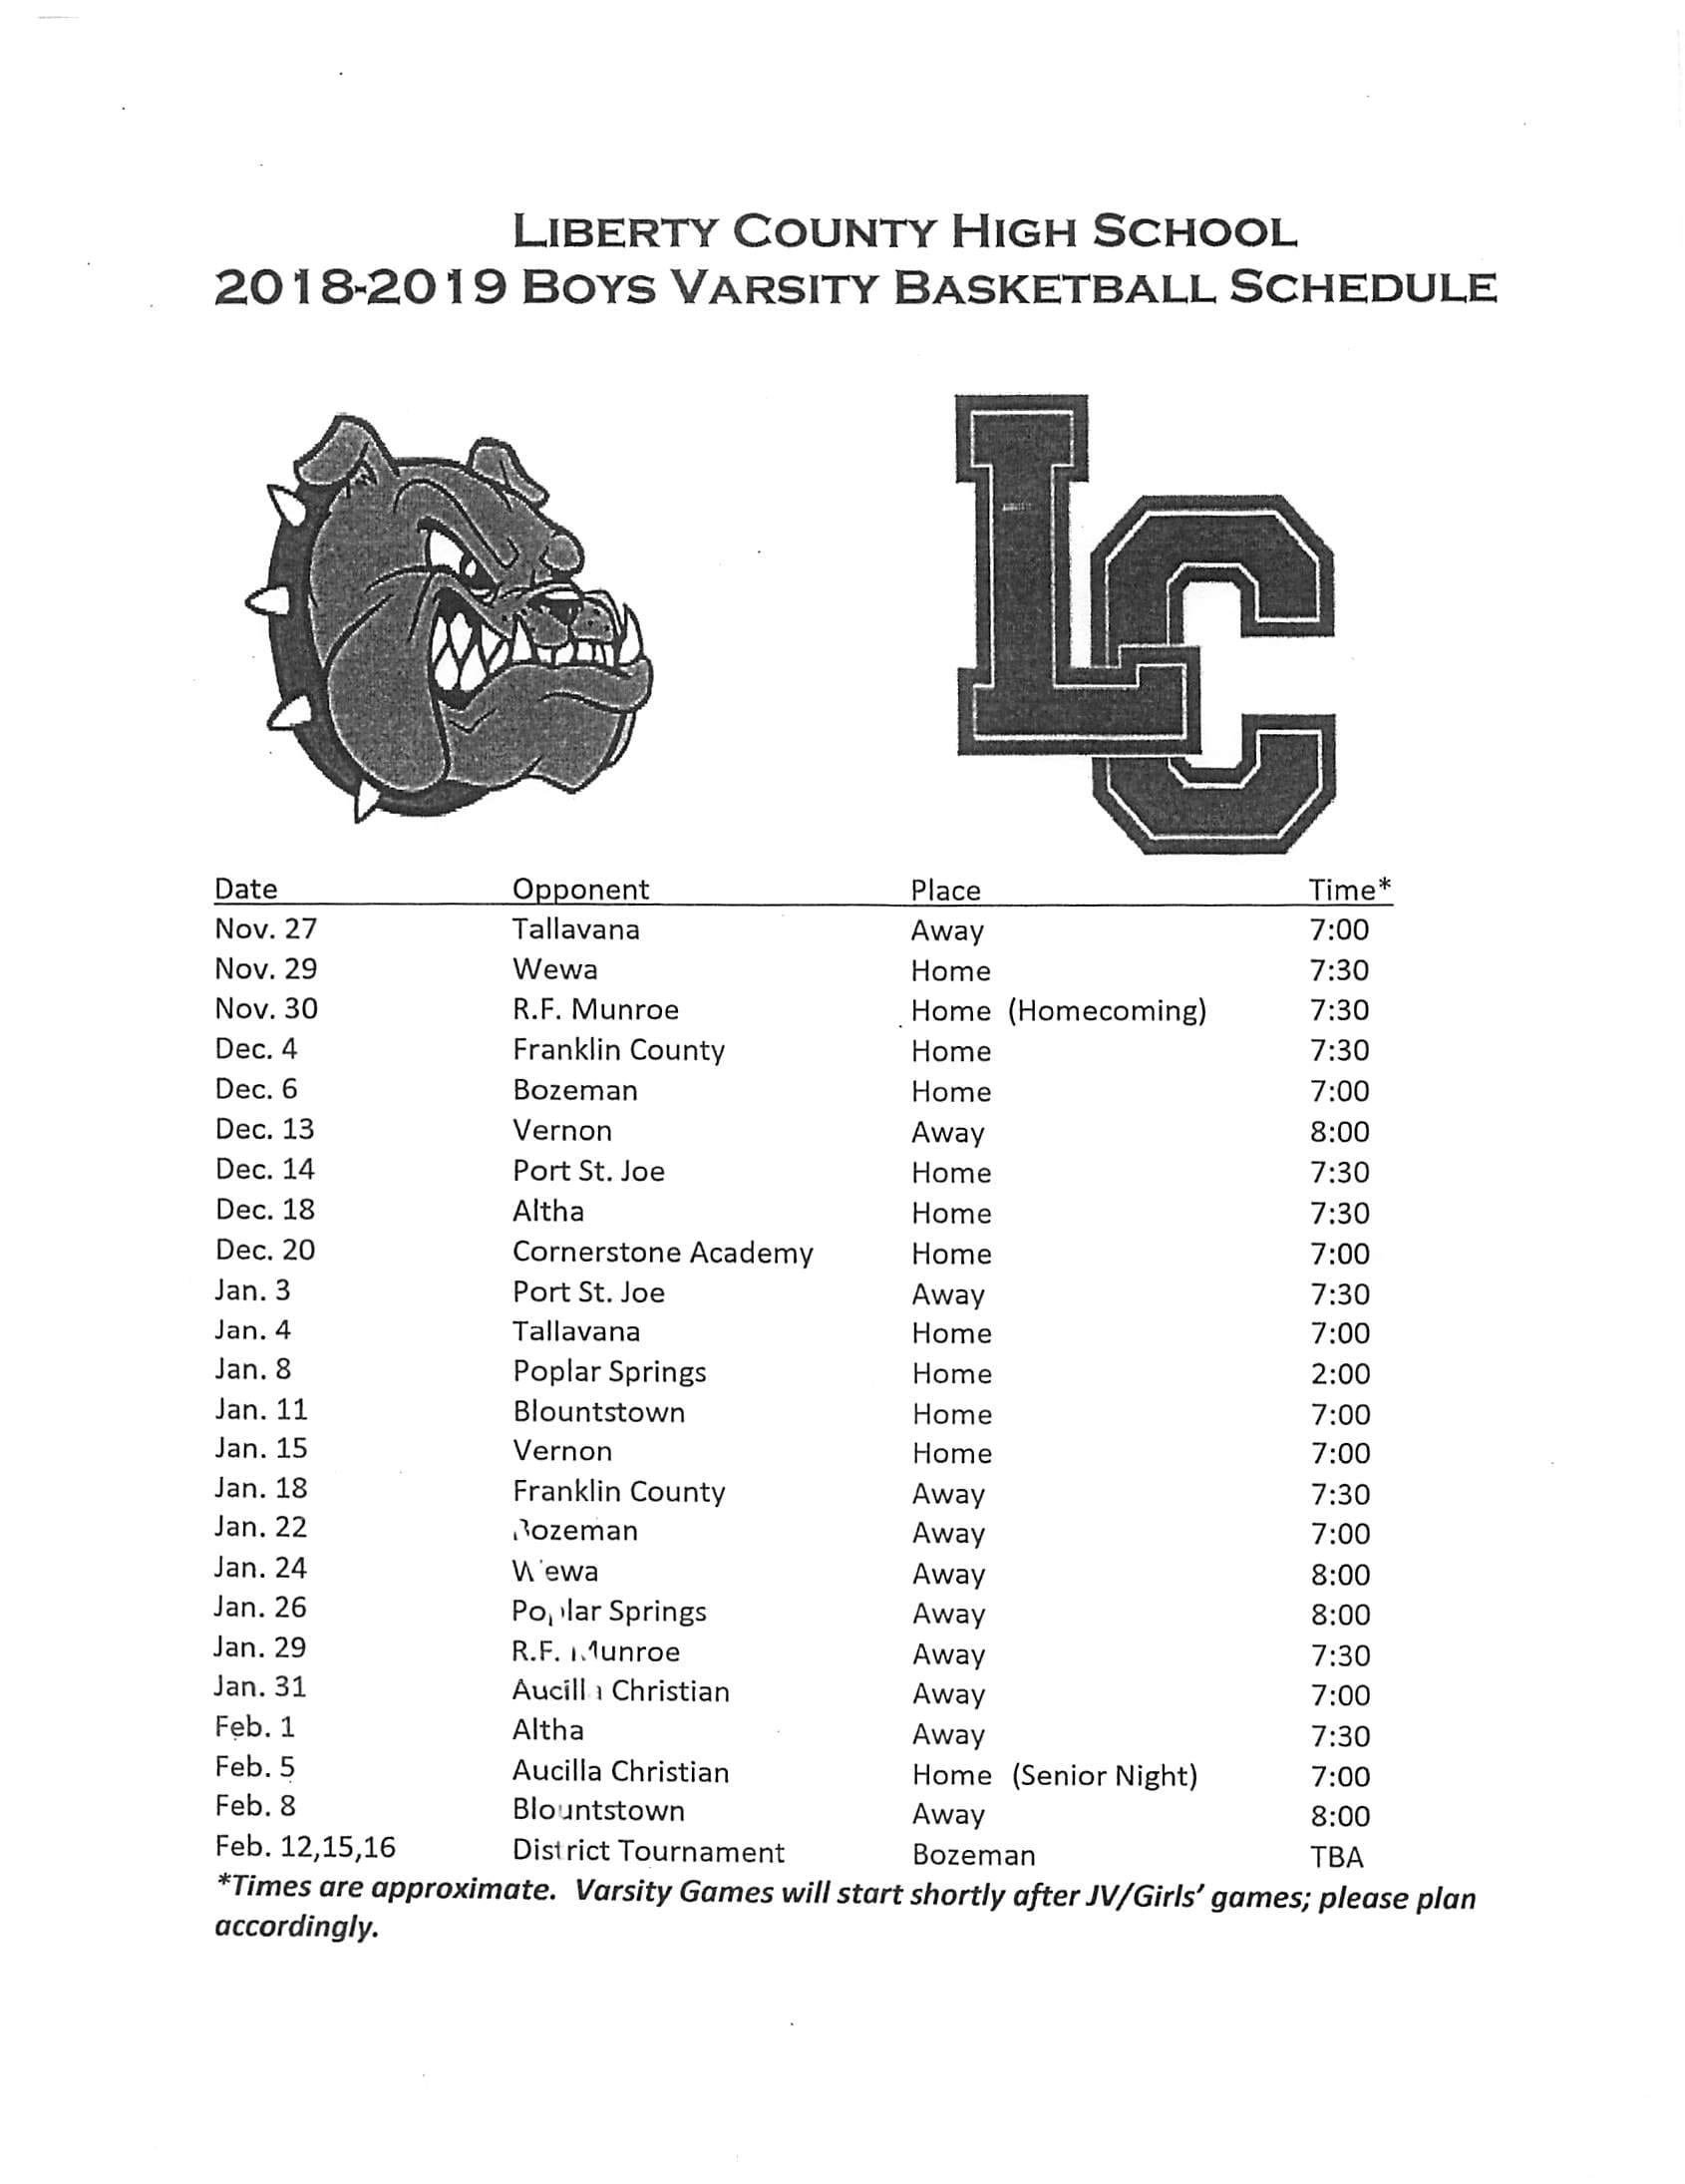 2018-2019 Boys Varsity Basketball Schedule